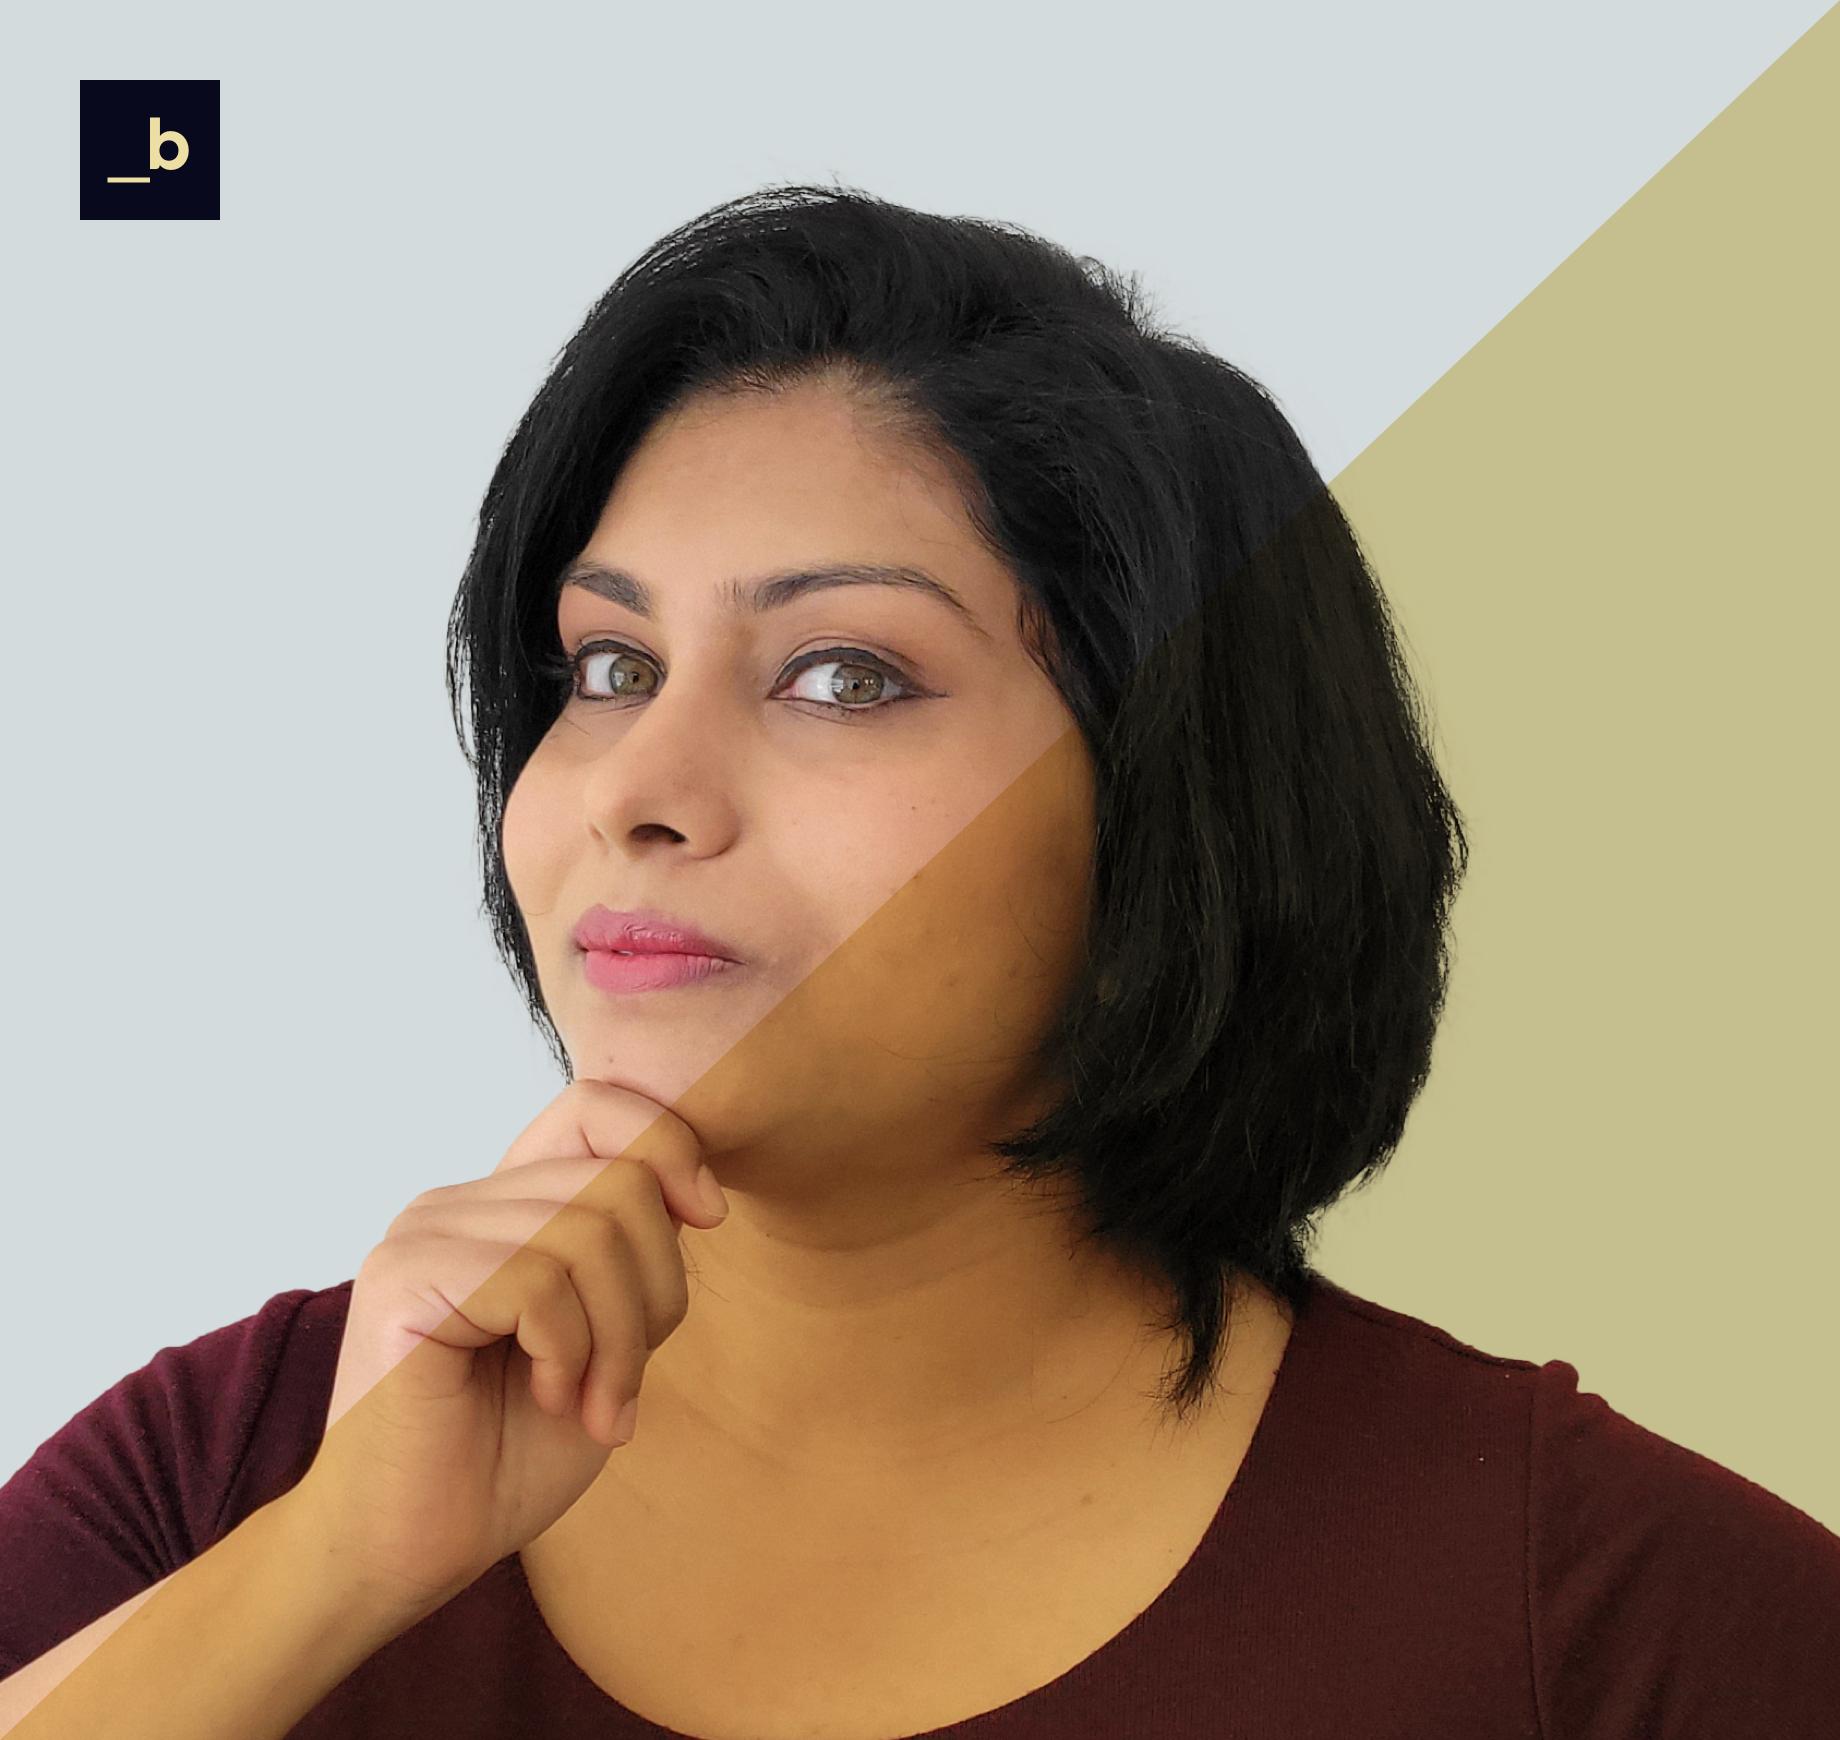 Image of Nihara vankayala